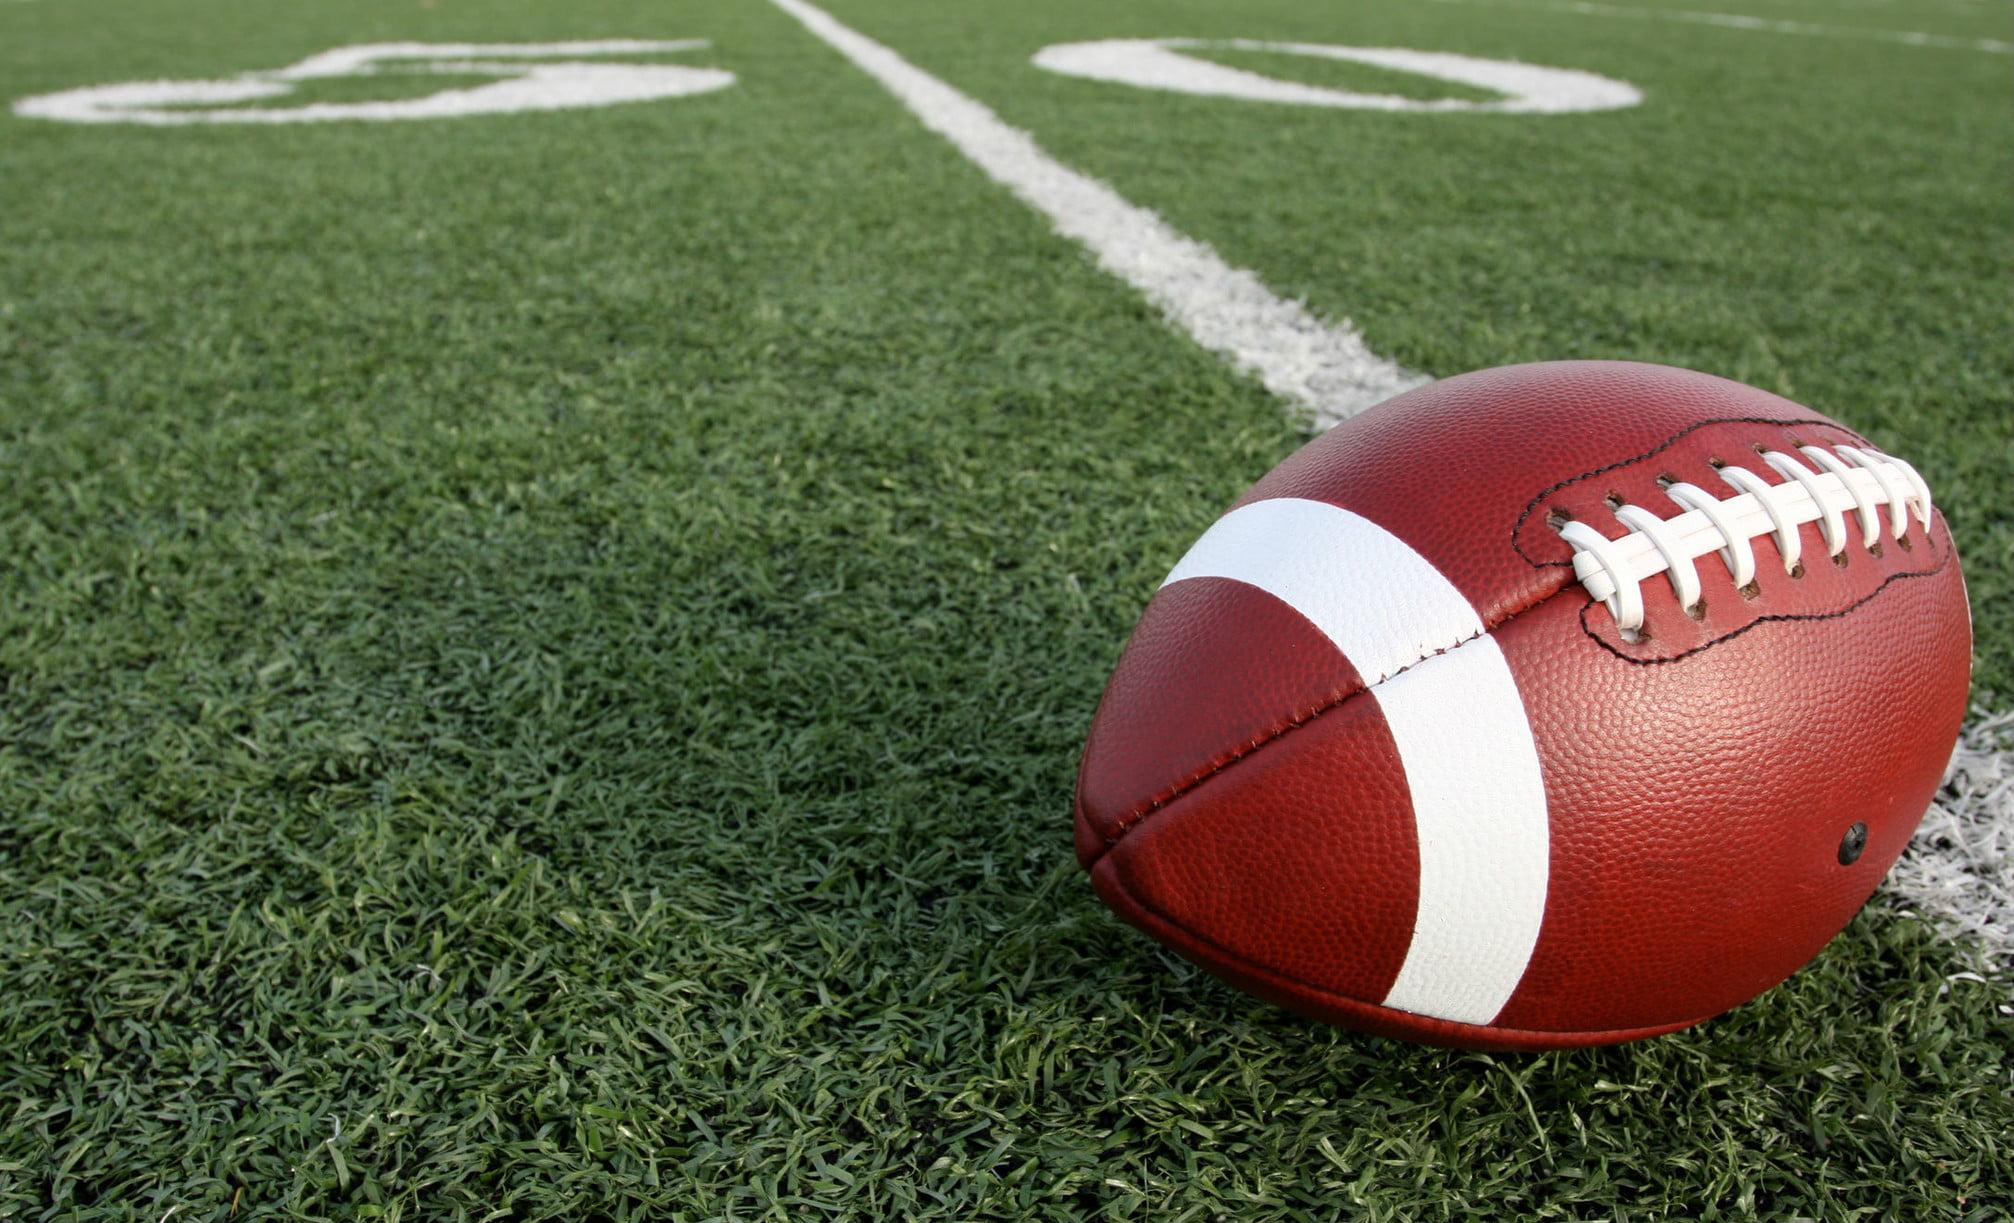 football-50-yard-line-dreamstime_m_15024968-2-2175x1223.jpg